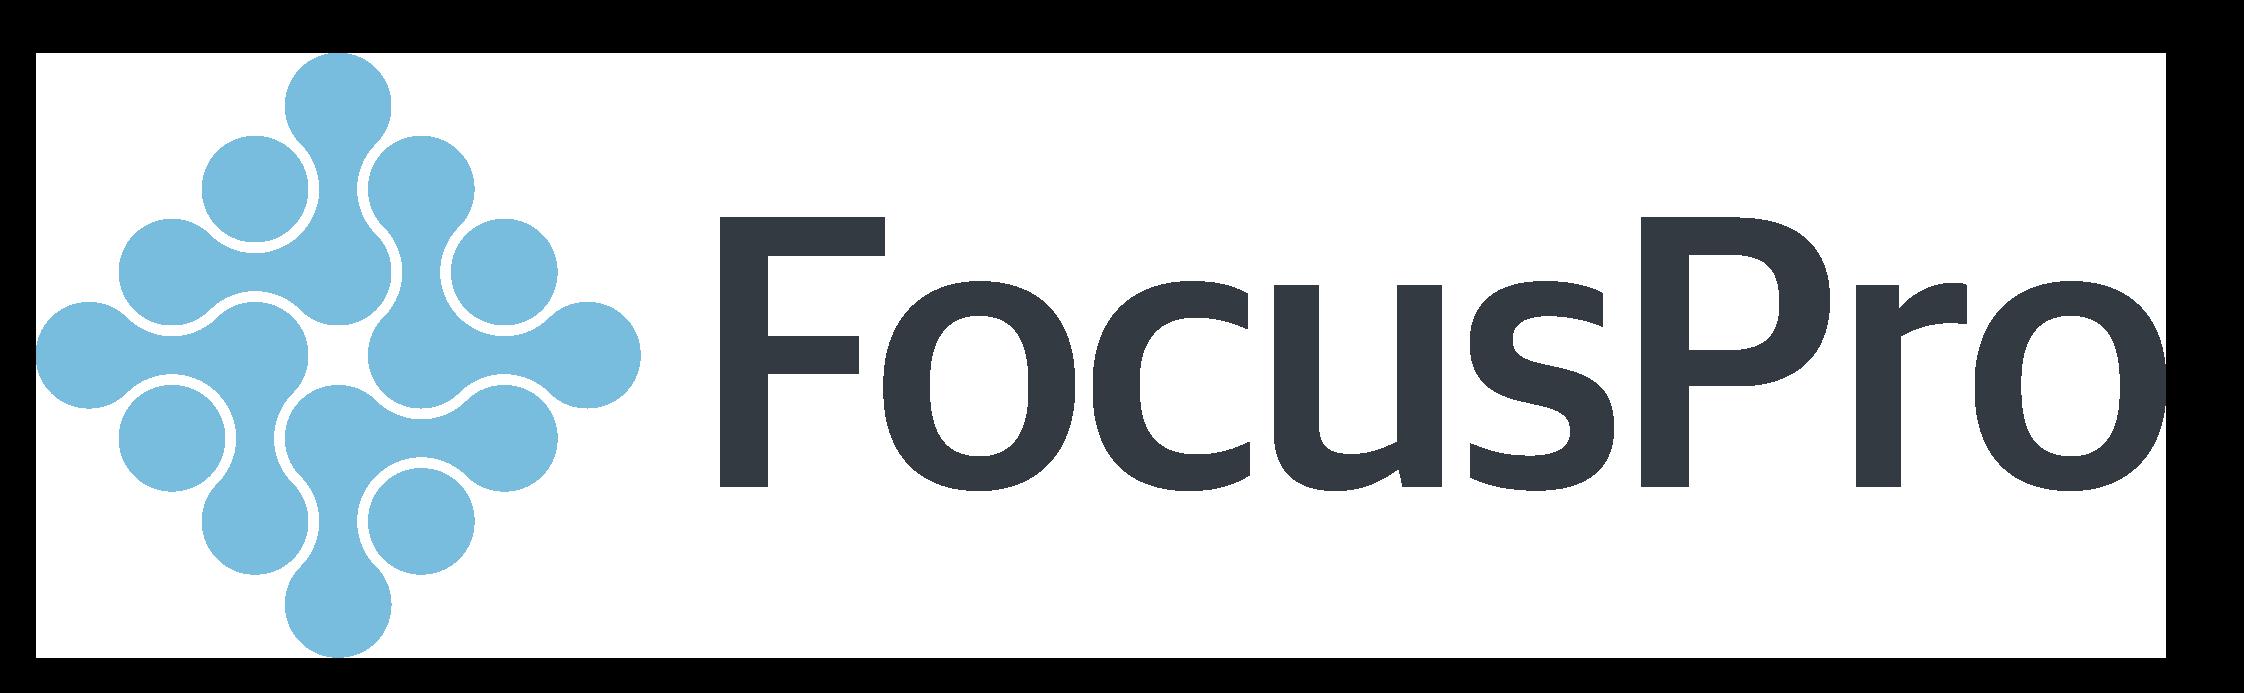 FocusPro HOR_Pos RGB.png